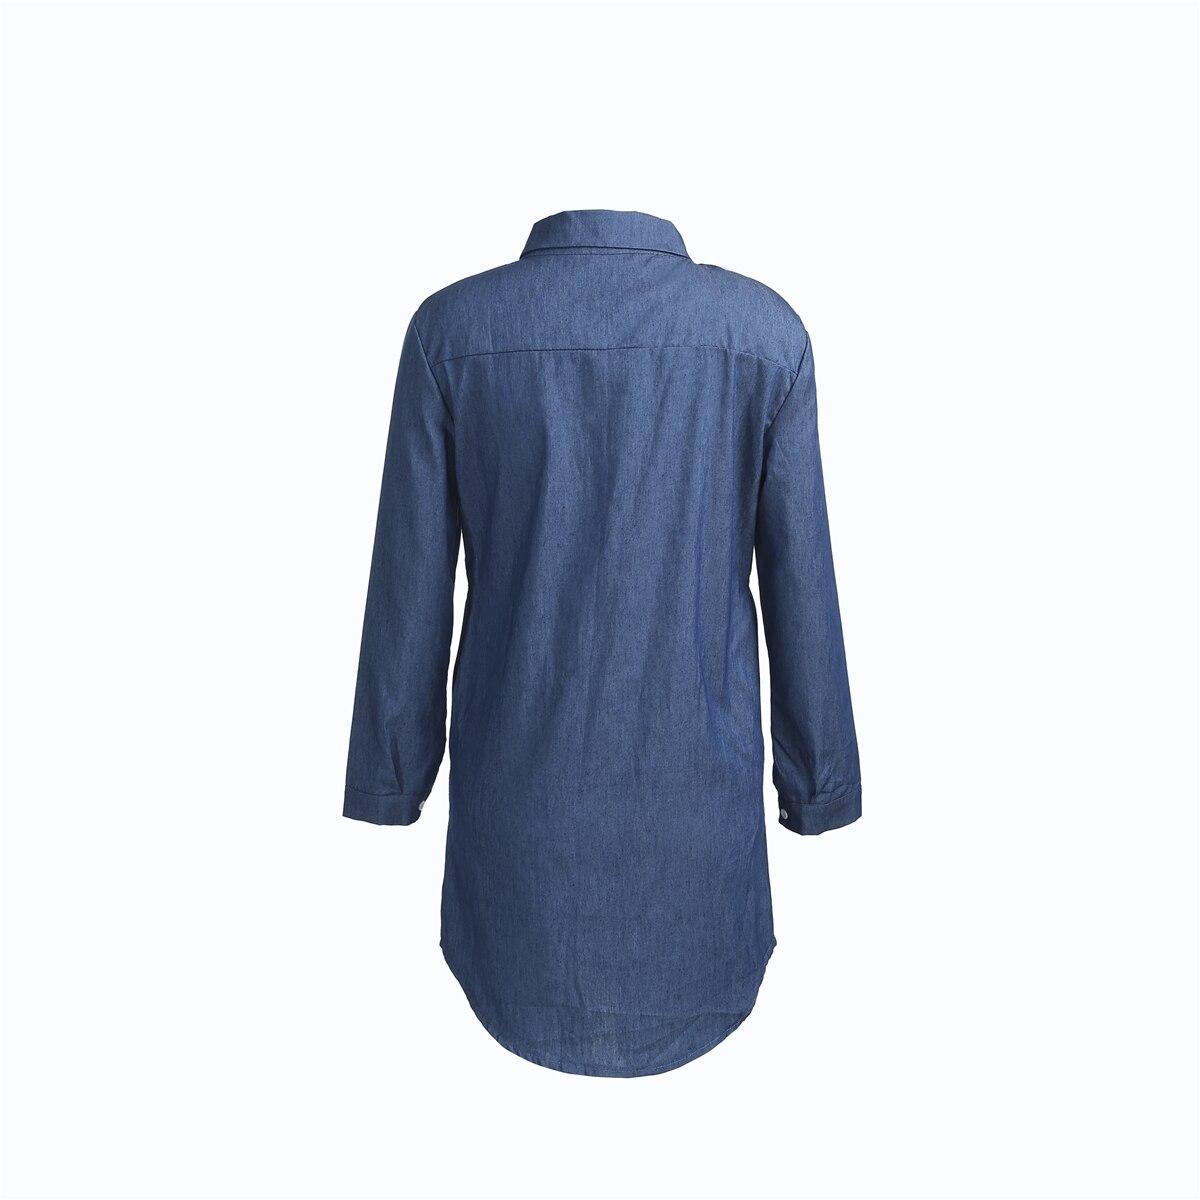 Women Denim Dresses Autumn Fashion Turn Down Collar Mini Dress Lapel Long Tops Shirt Ladies Long Sleeve Holiday Mini Dress S-2XL 3